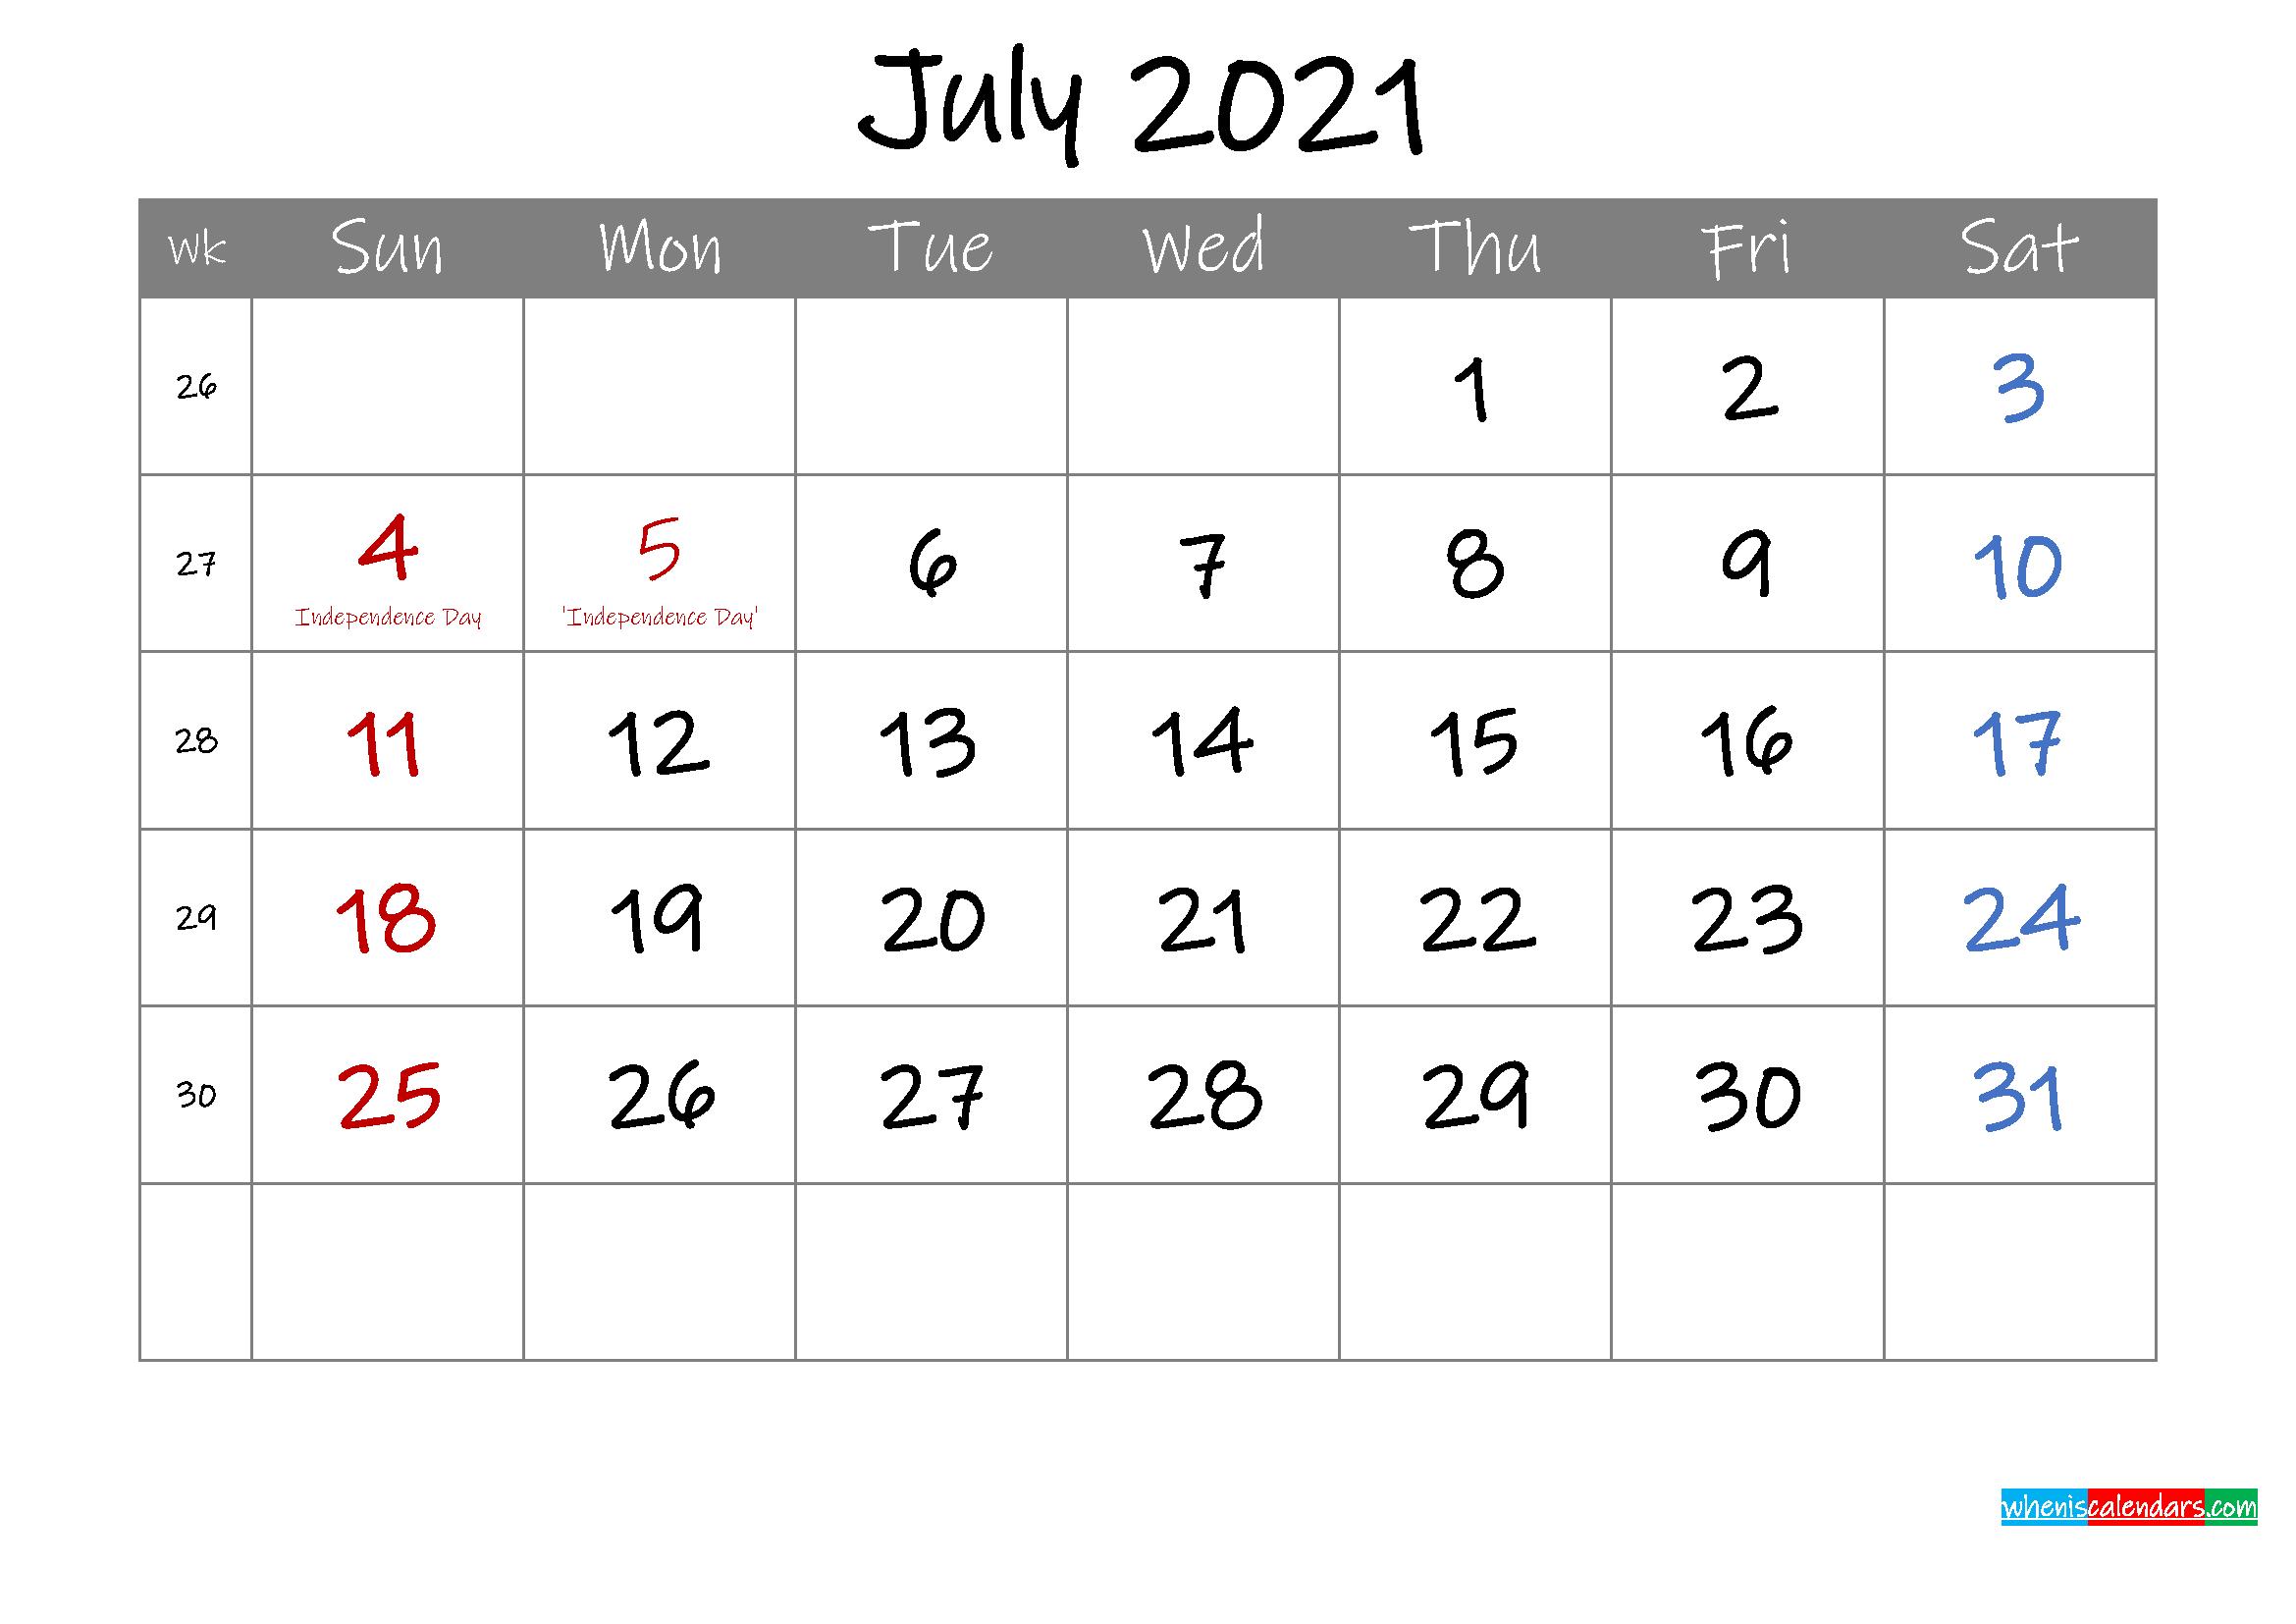 Editable July 2021 Calendar with Holidays - Template ...